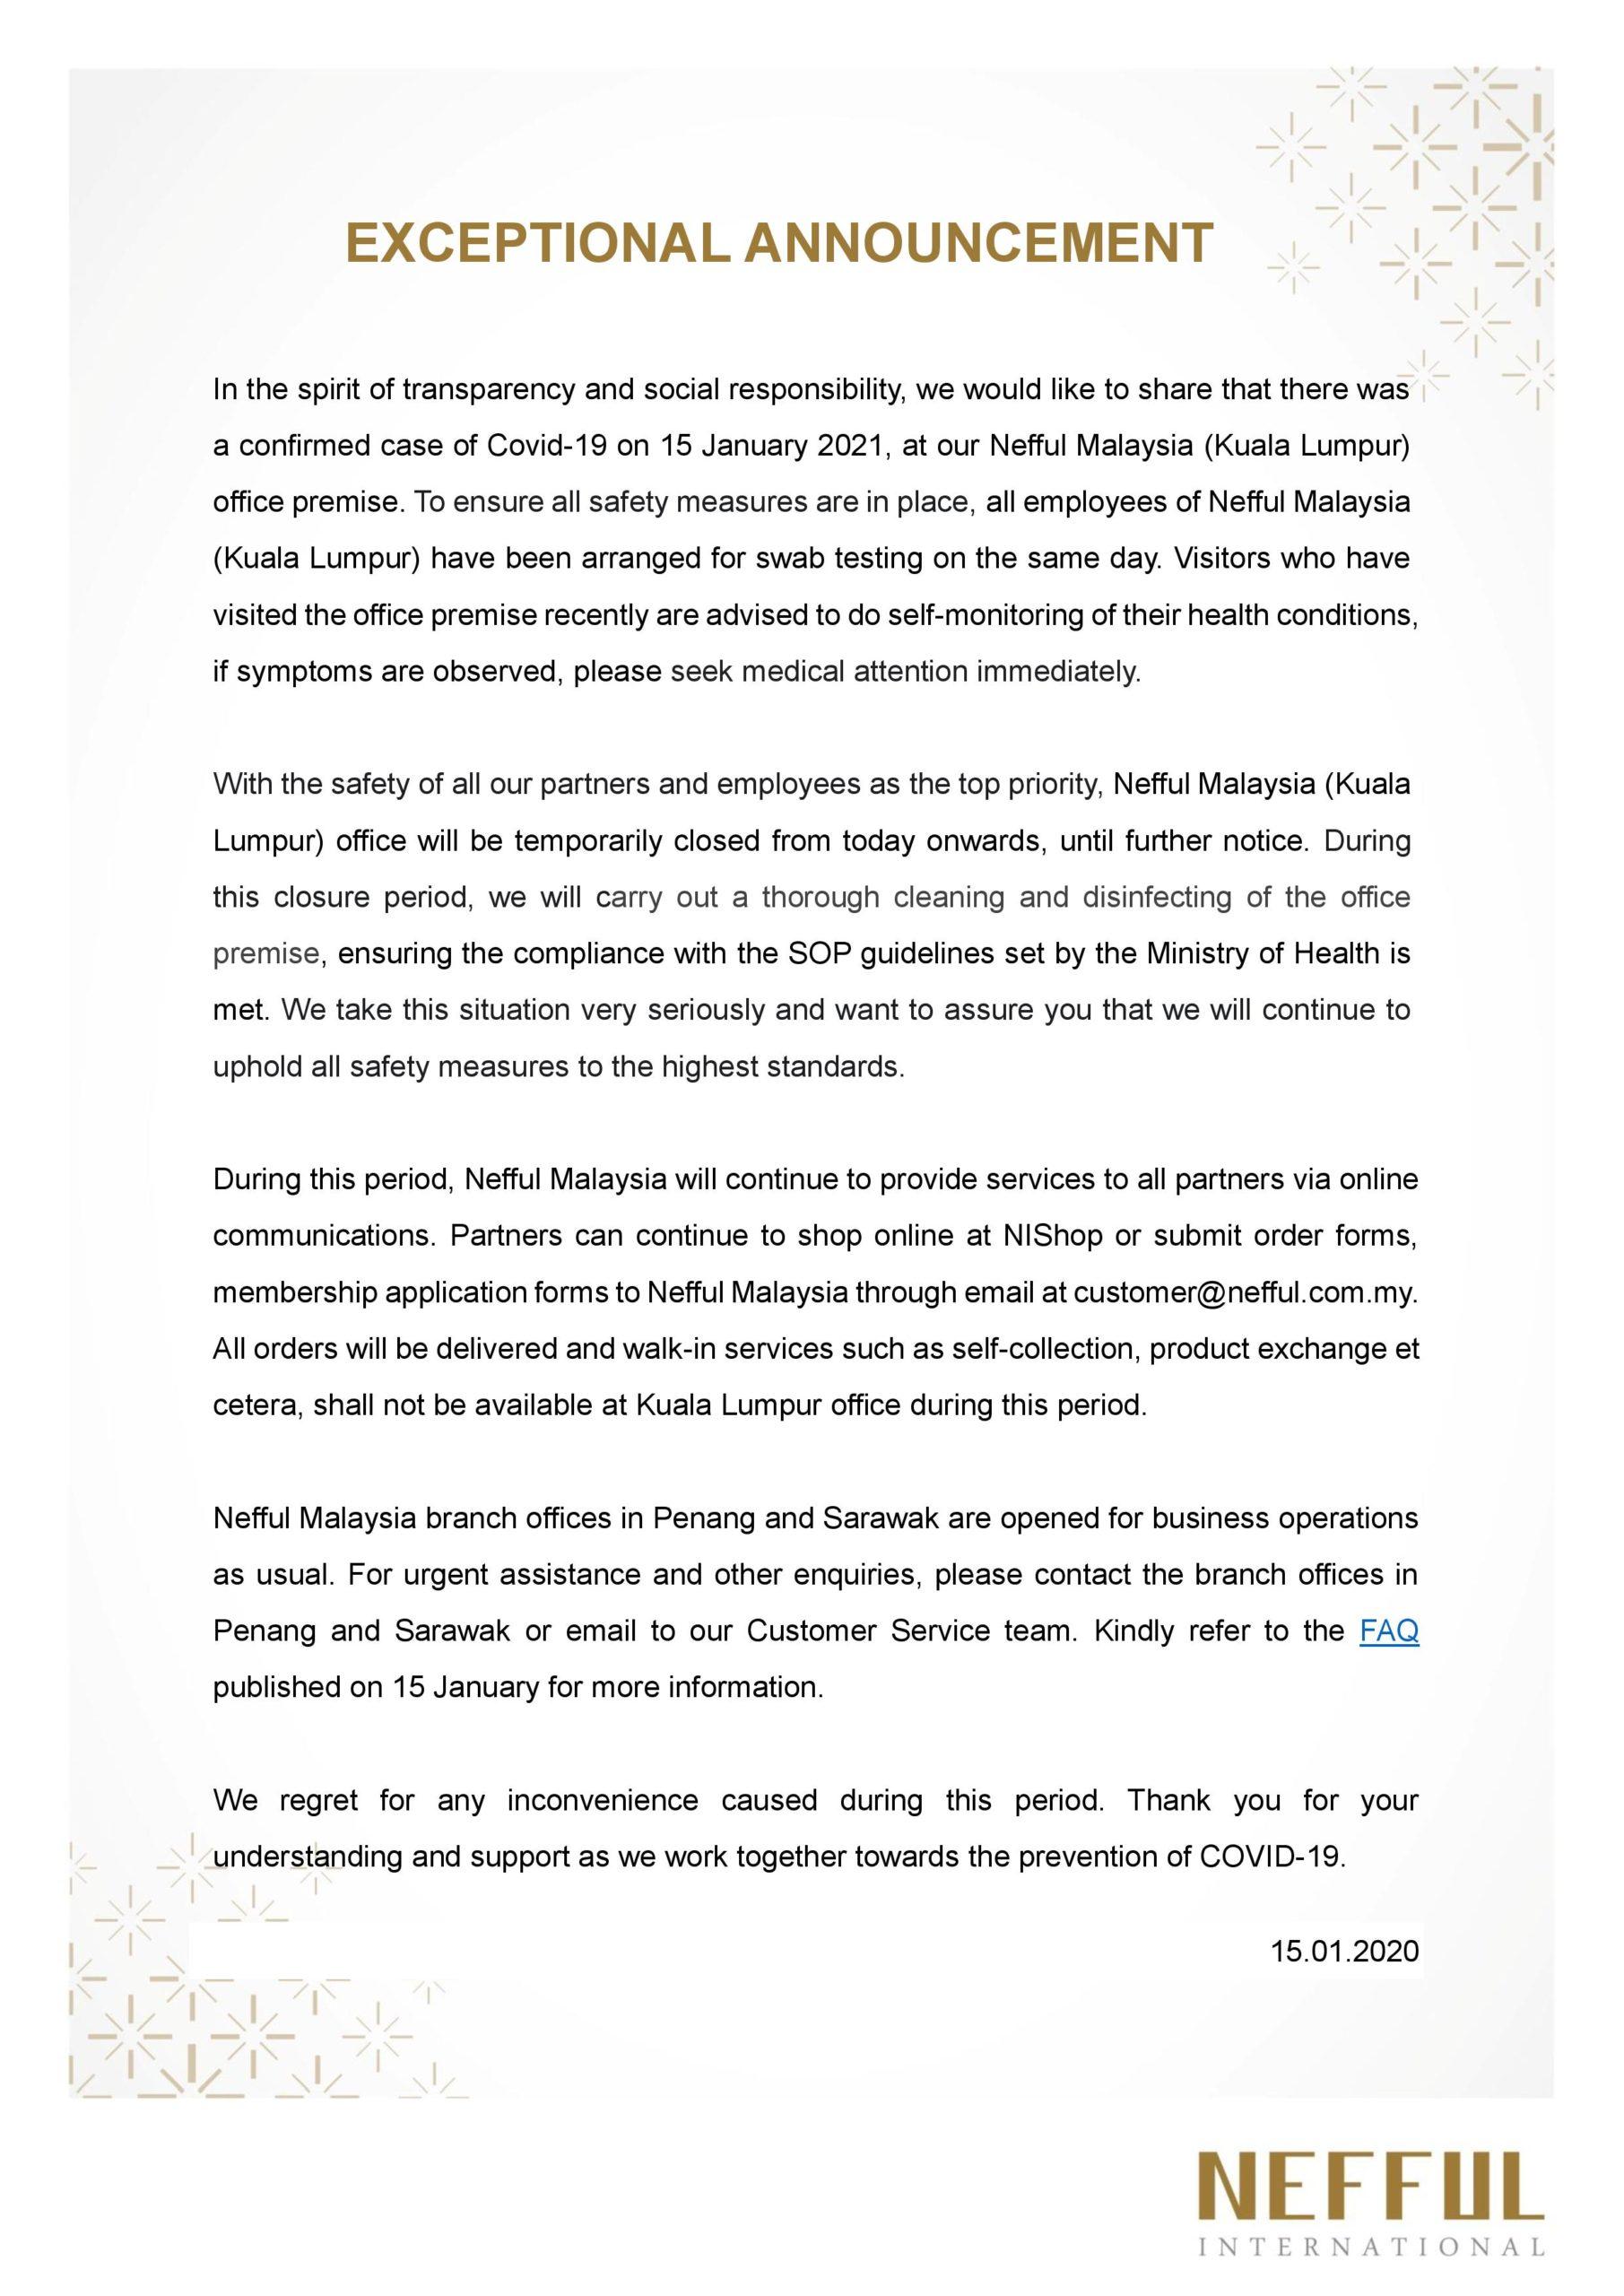 EN Exceptional Announcement (Covid-19)-page-001